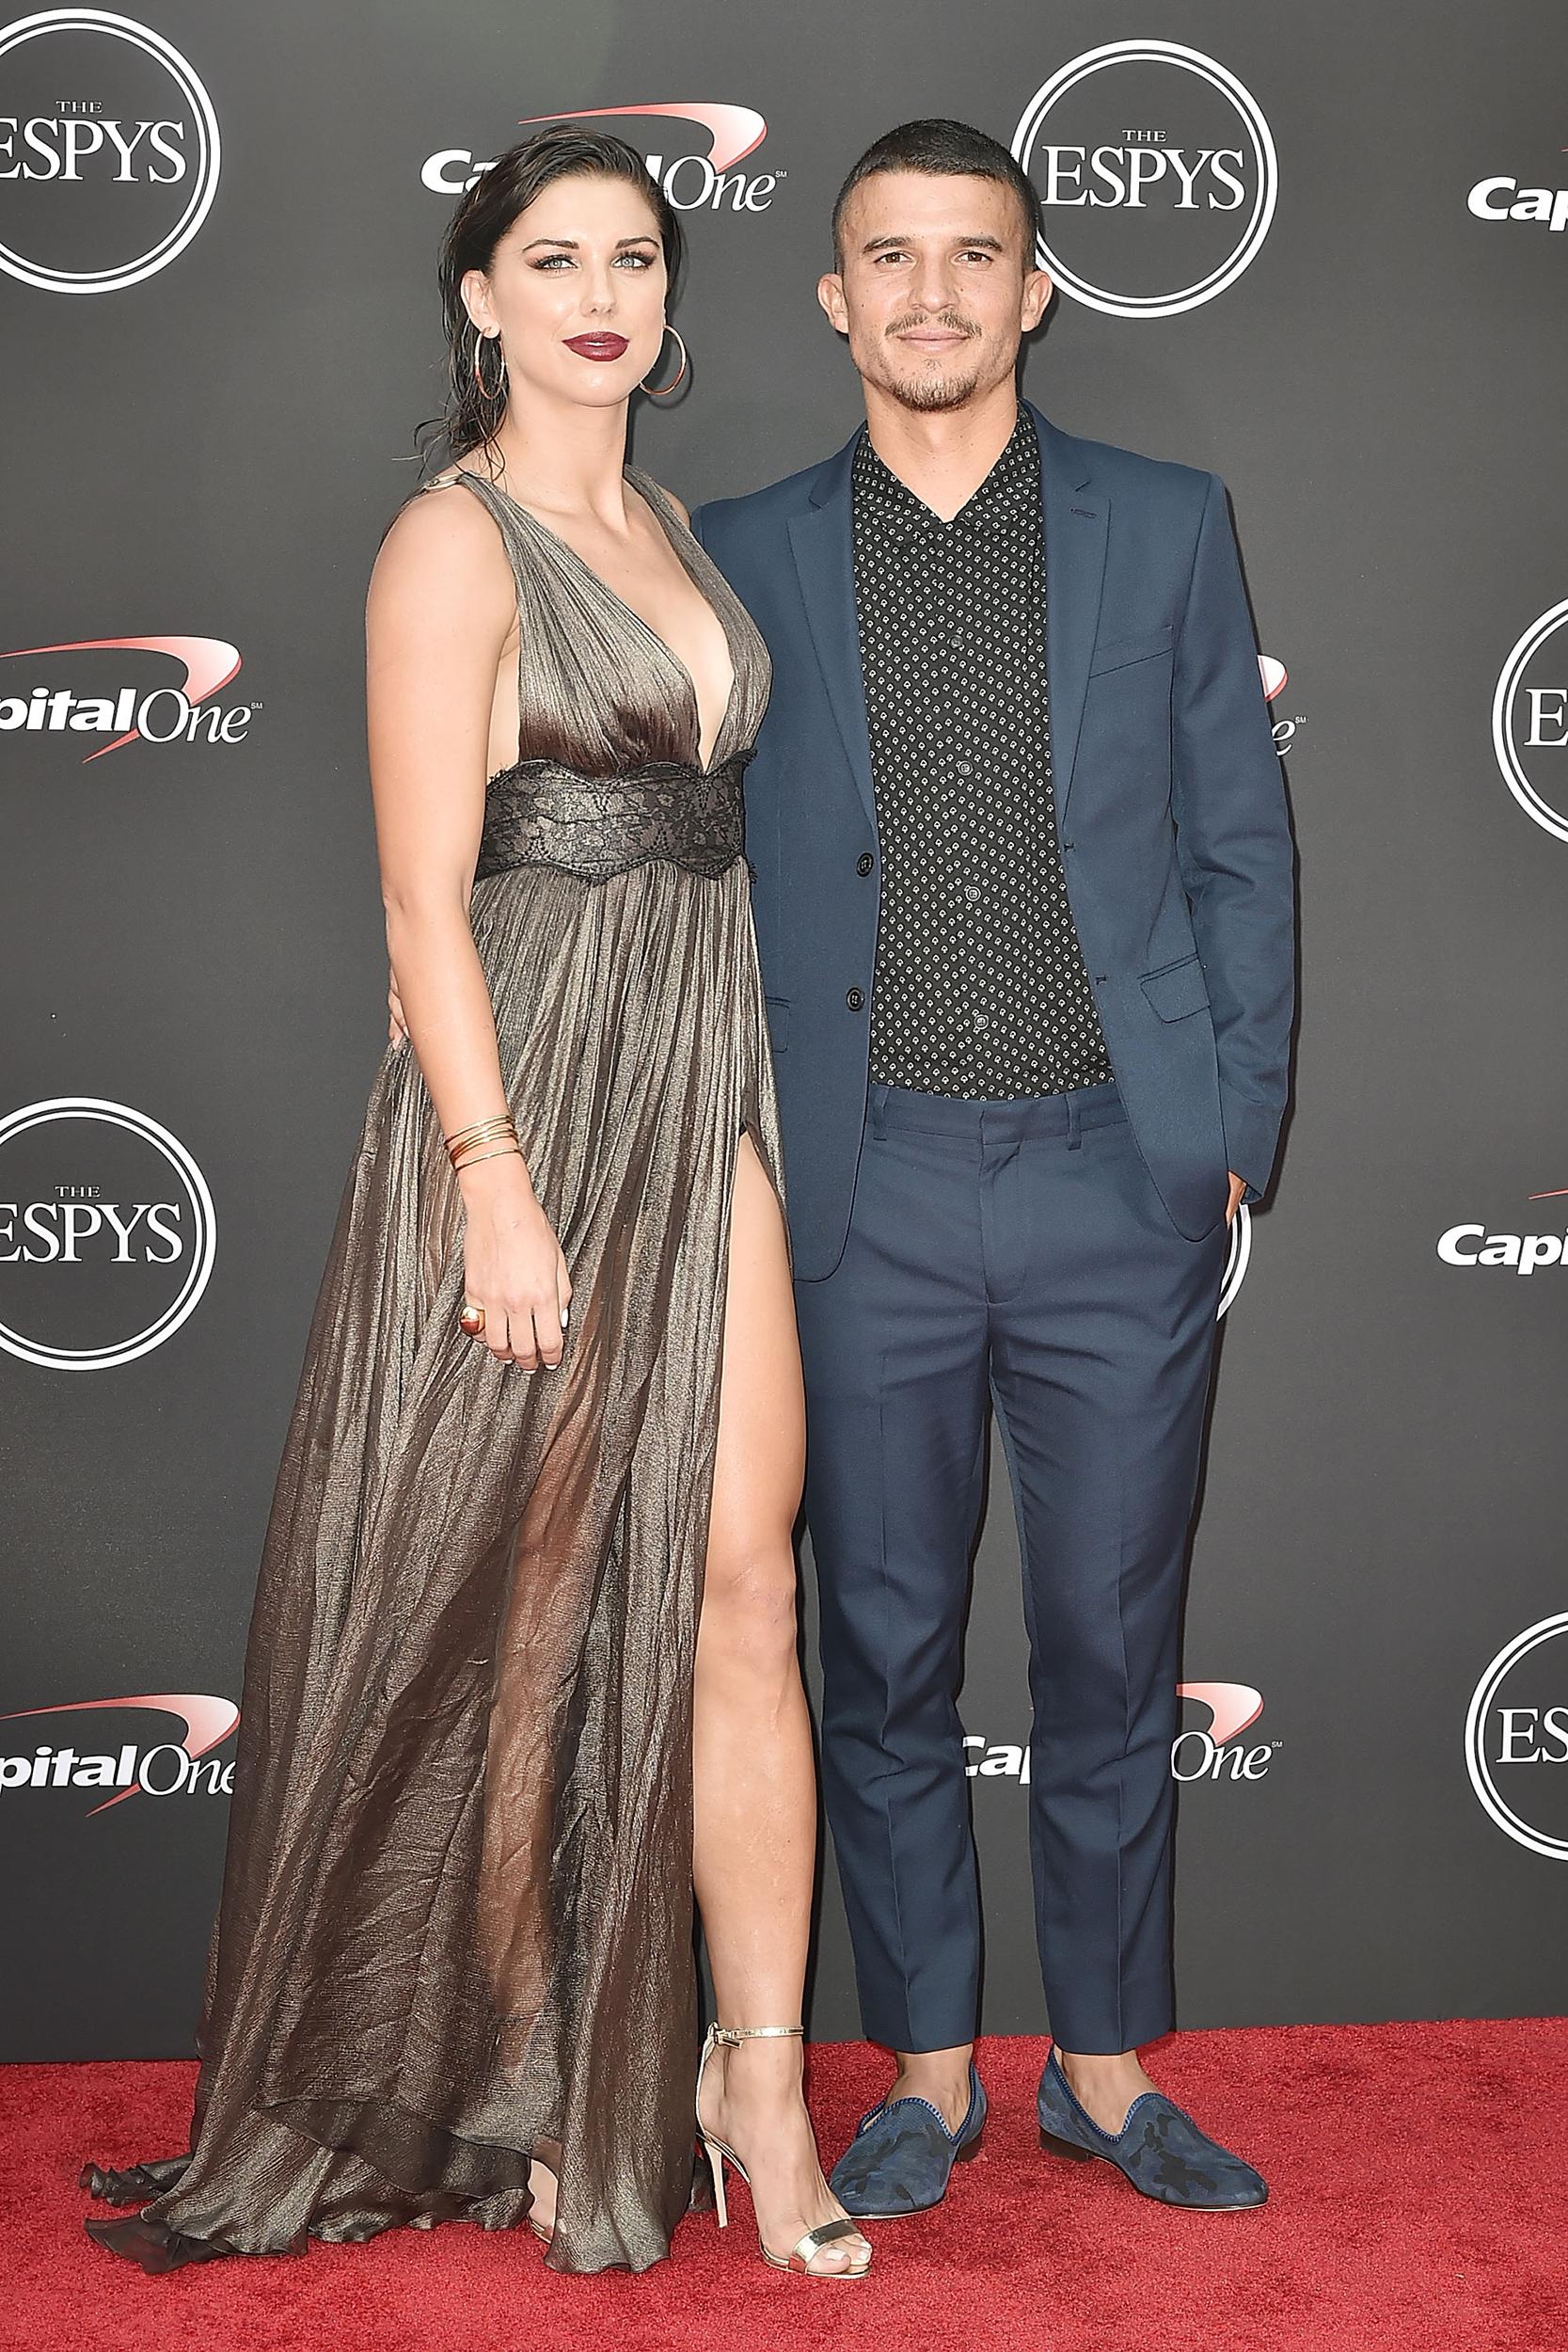 Soccer Stars Alex Morgan And Servando Carrasco Expecting 1st Child